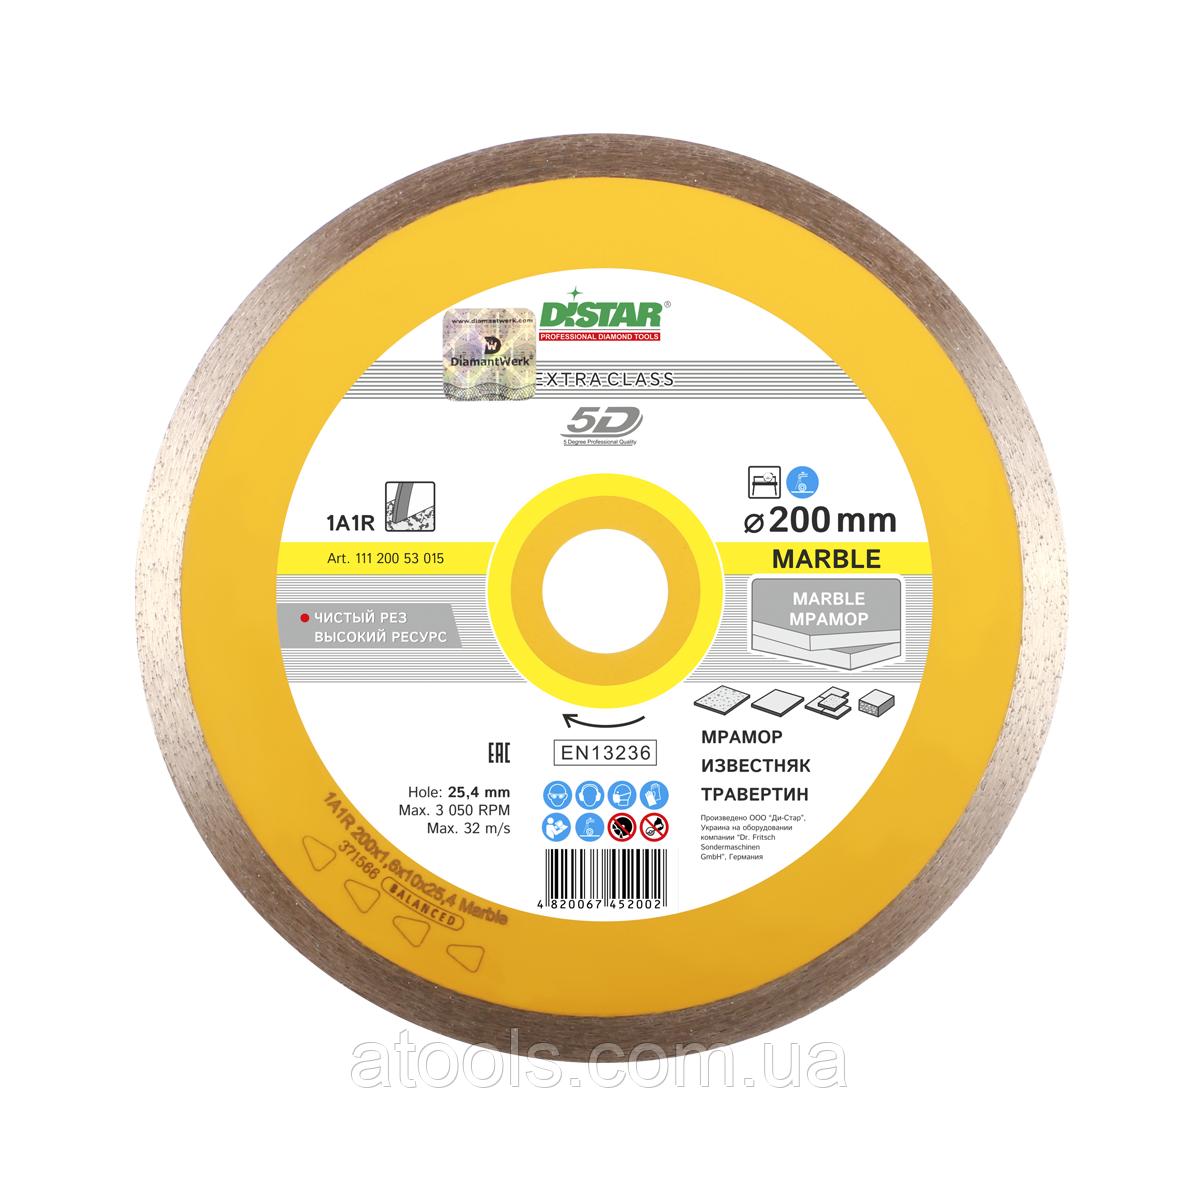 Алмазный отрезной диск Distar Marble 1A1R 125x1.4x8x22.23 (11115053010)